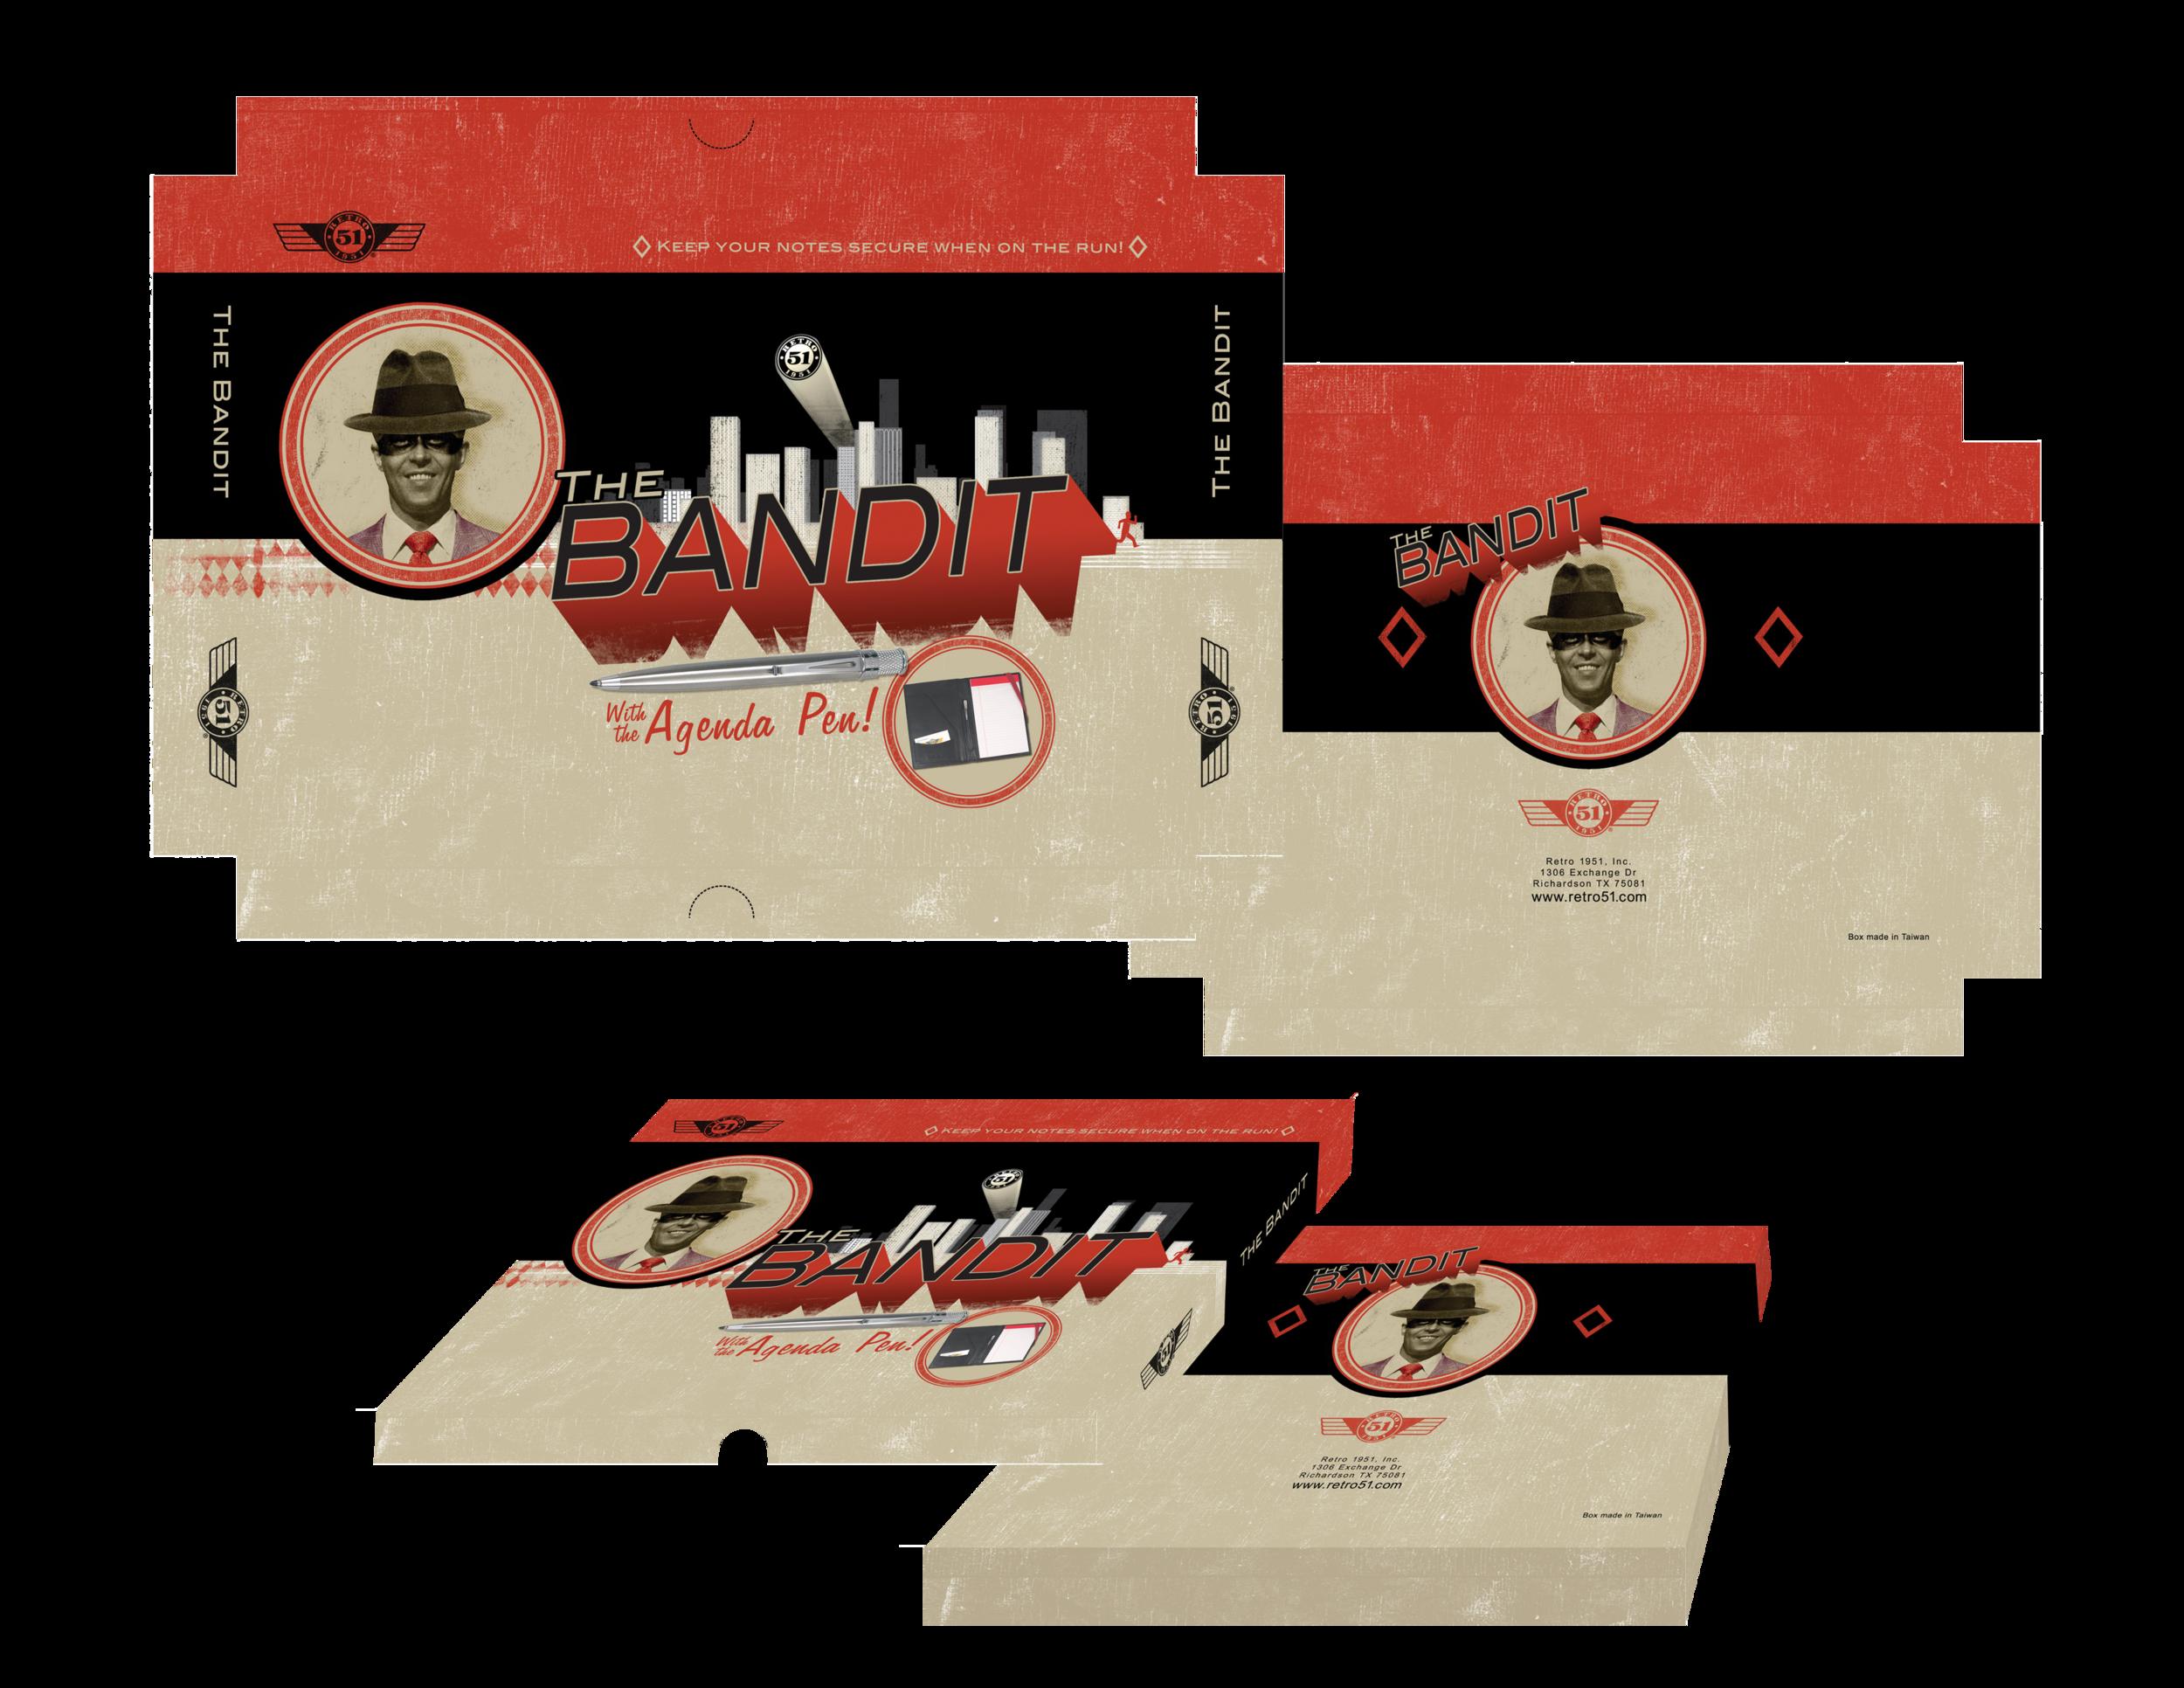 RETRO 1951 BANDIT LEATHER PLANNER